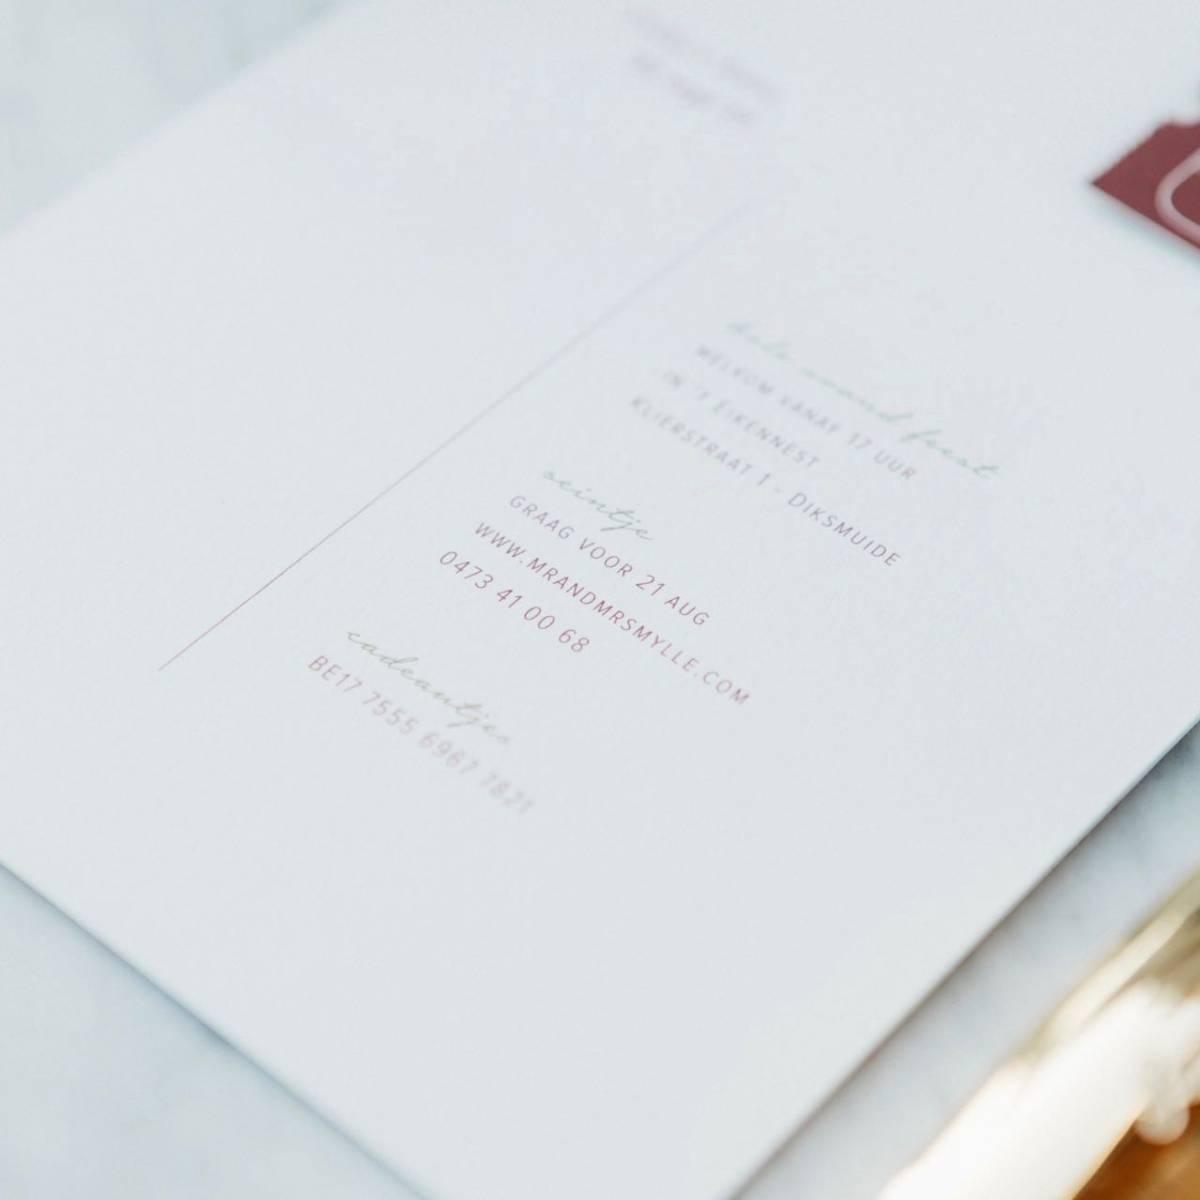 Scarabar - Trouwuitnodiging - Huwelijksuitnodiging - Drukwerk - Huwelijk - Trouw - Bruiloft - House of Weddings - 33